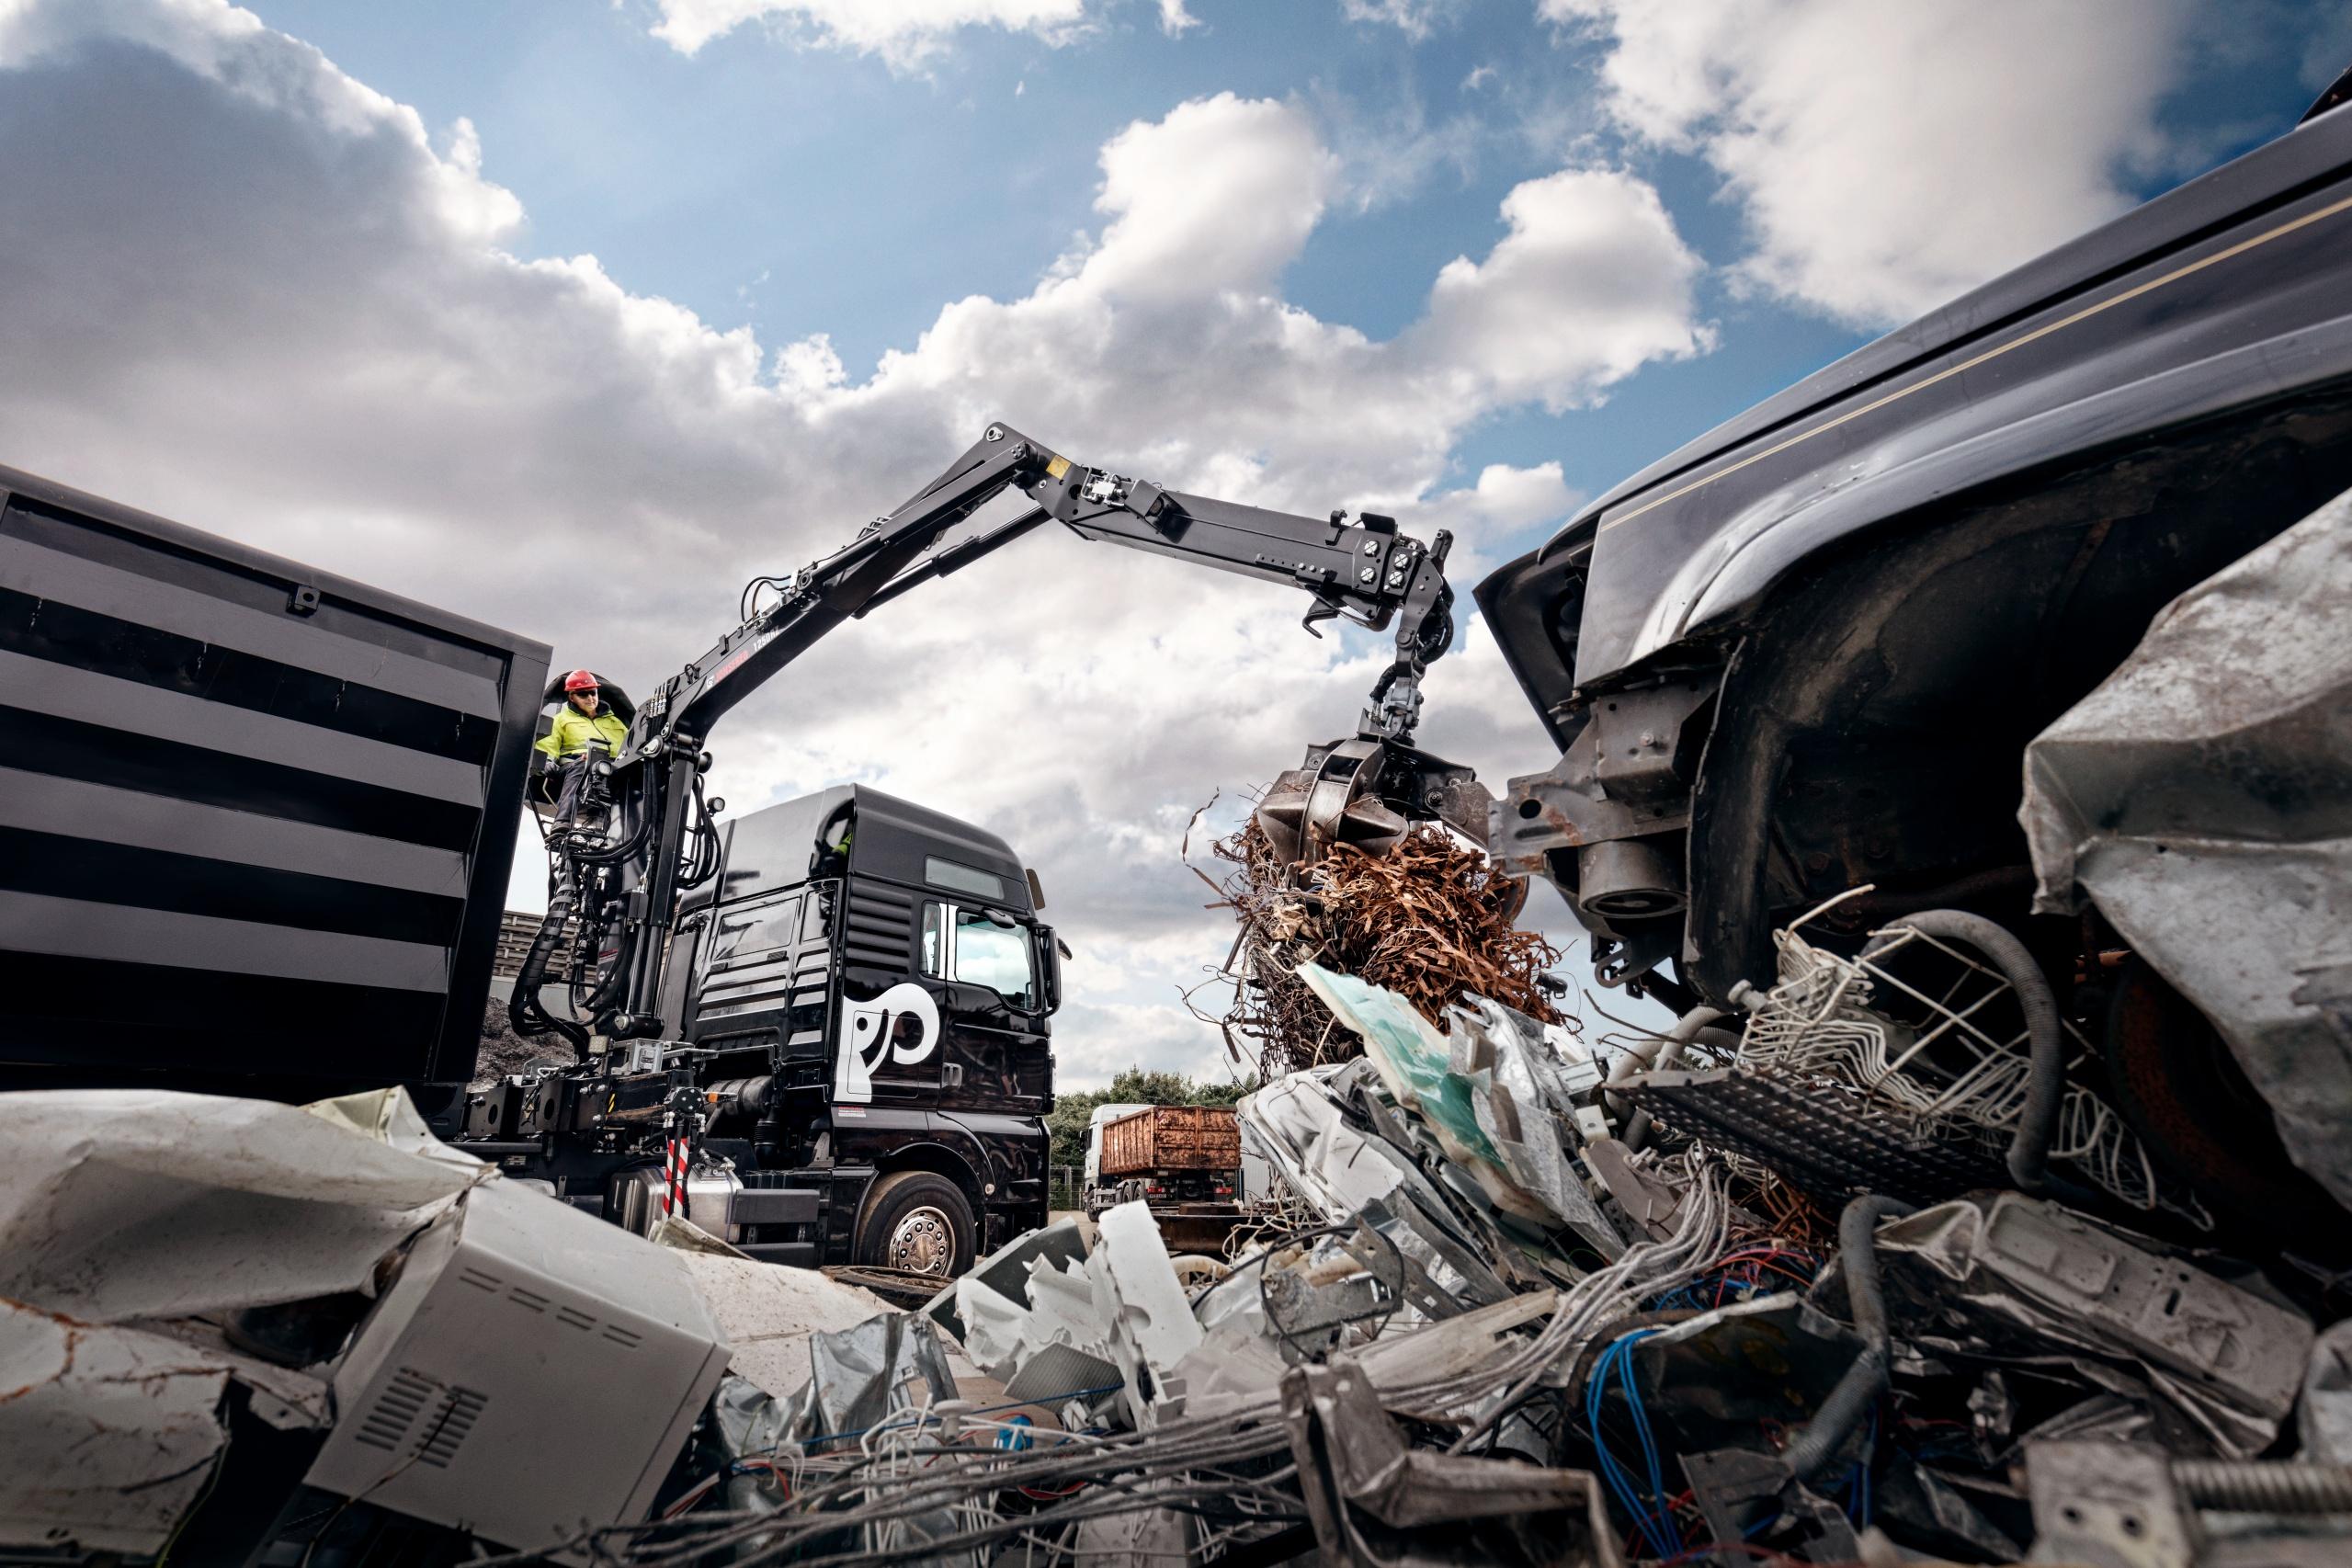 JONSERED 1250RZ recycling crane